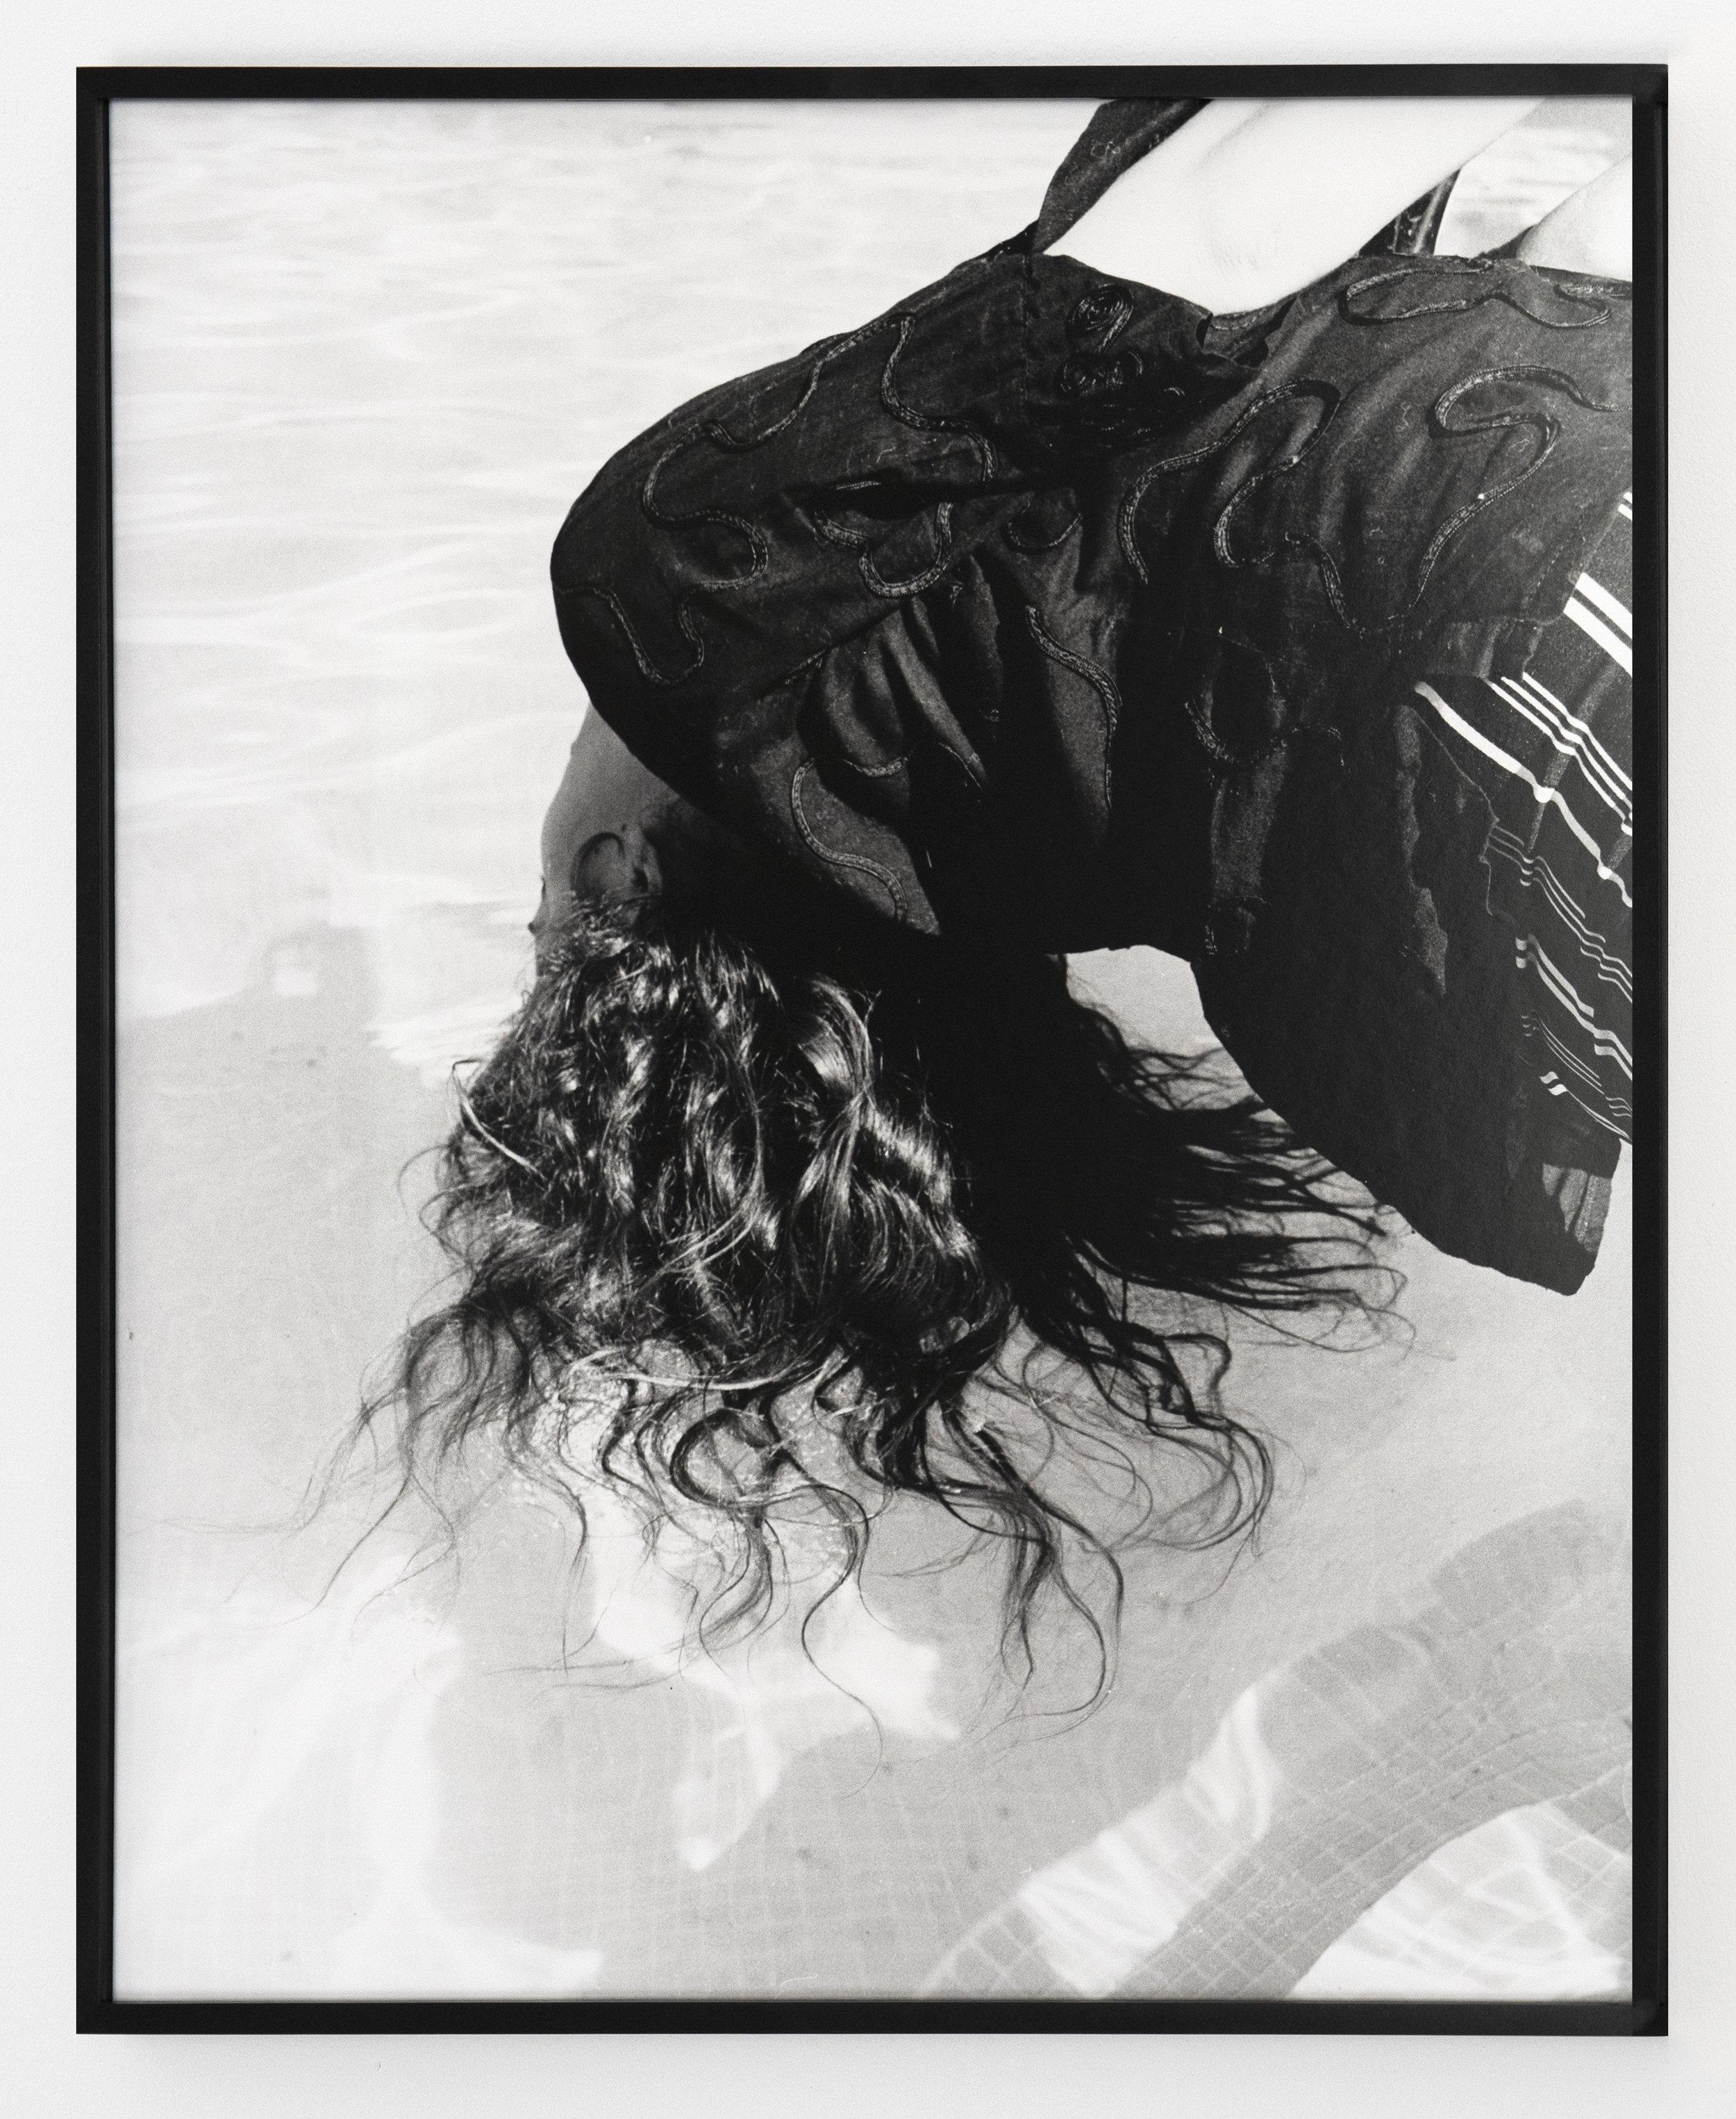 Hair in Pool , 2019, gelatin silver print, 20 x 24 inches